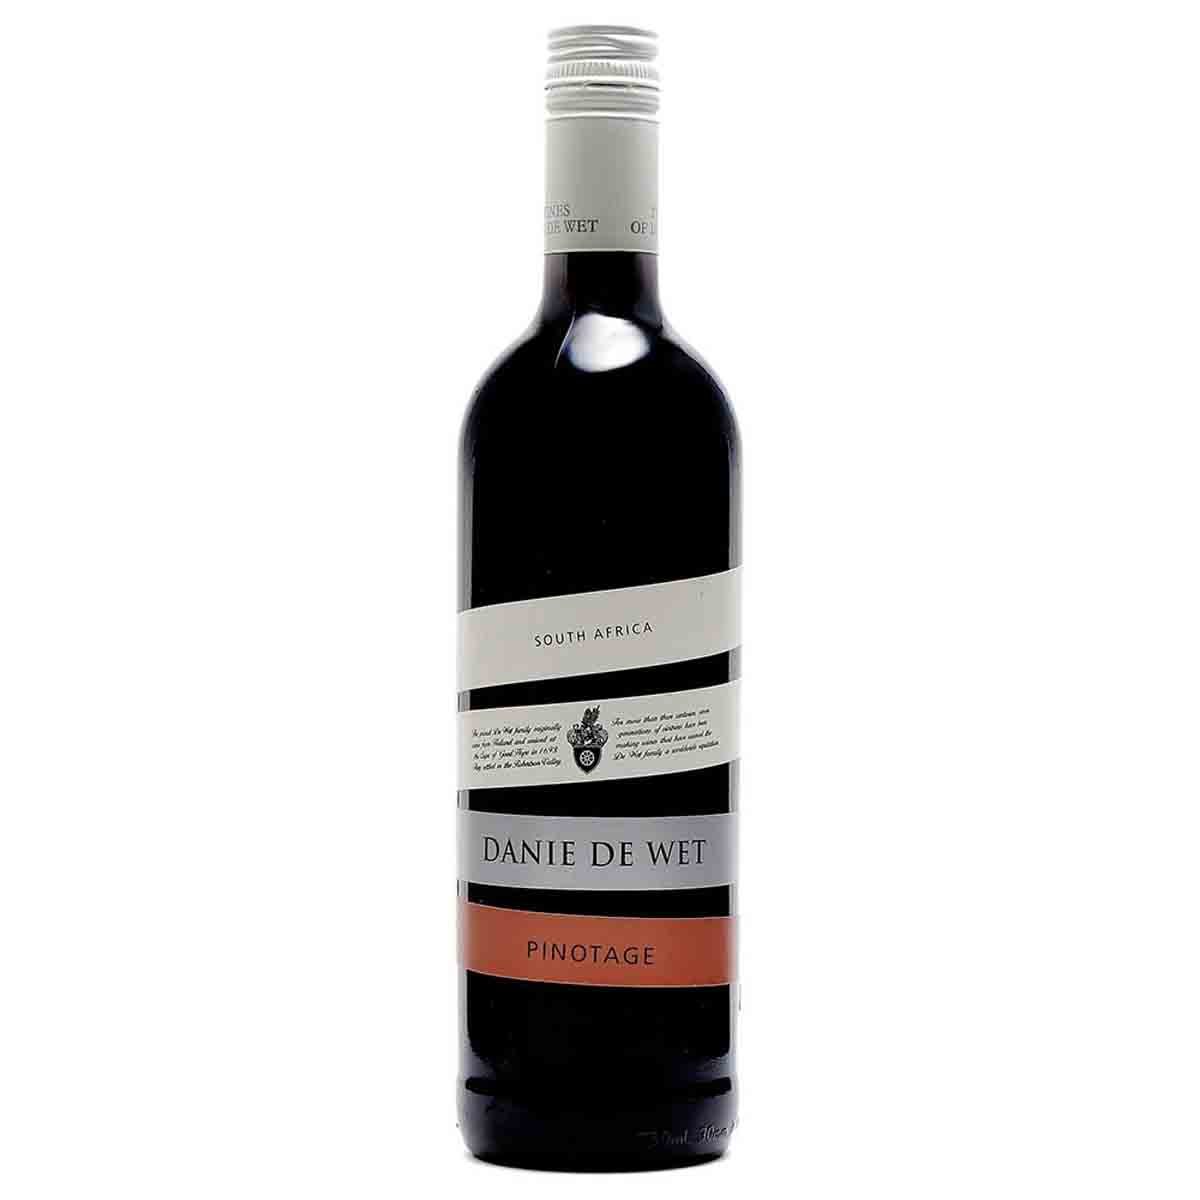 Vinho Tinto Sul-Africano Danie De Wet Pinotage 2018 750ml